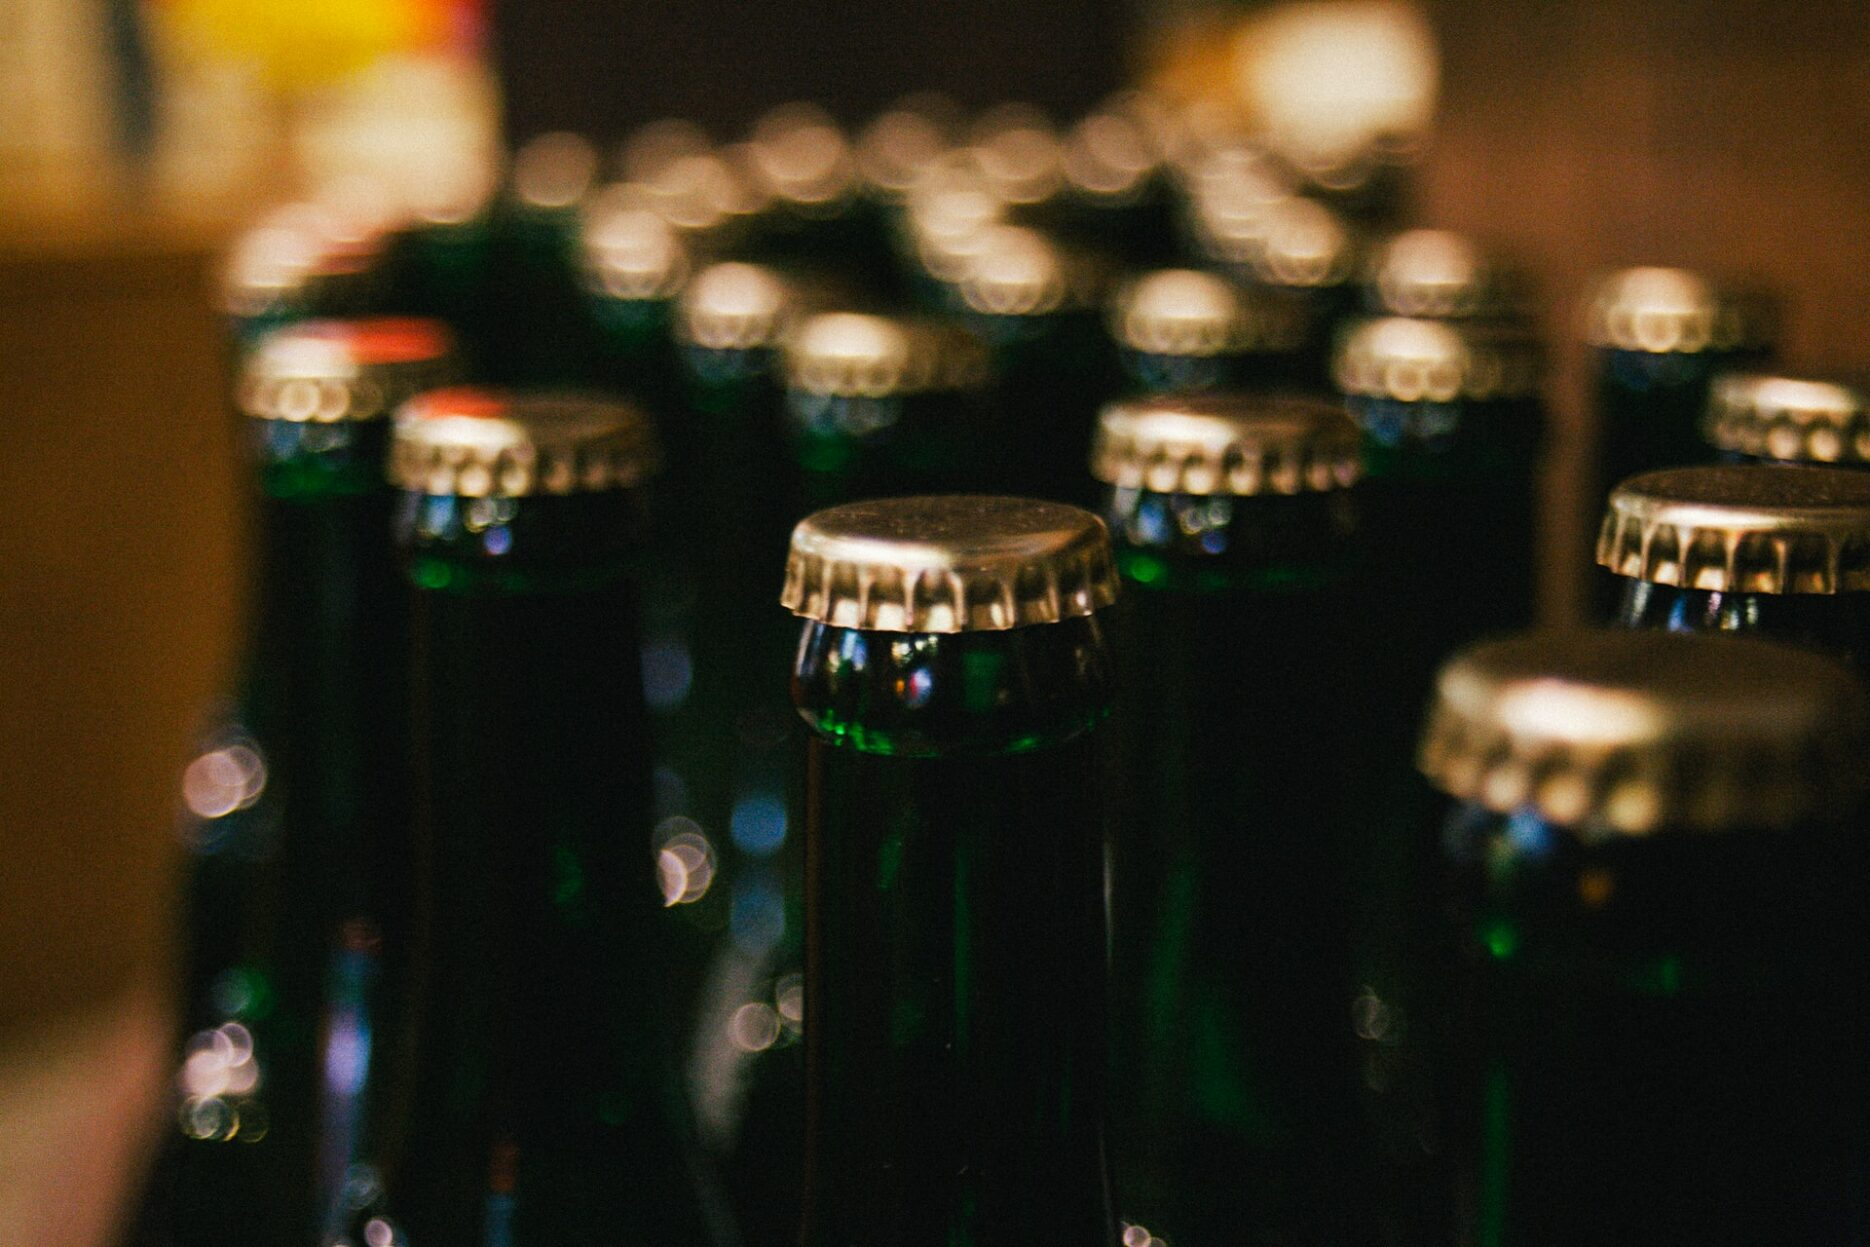 Alkoholkonsum in China